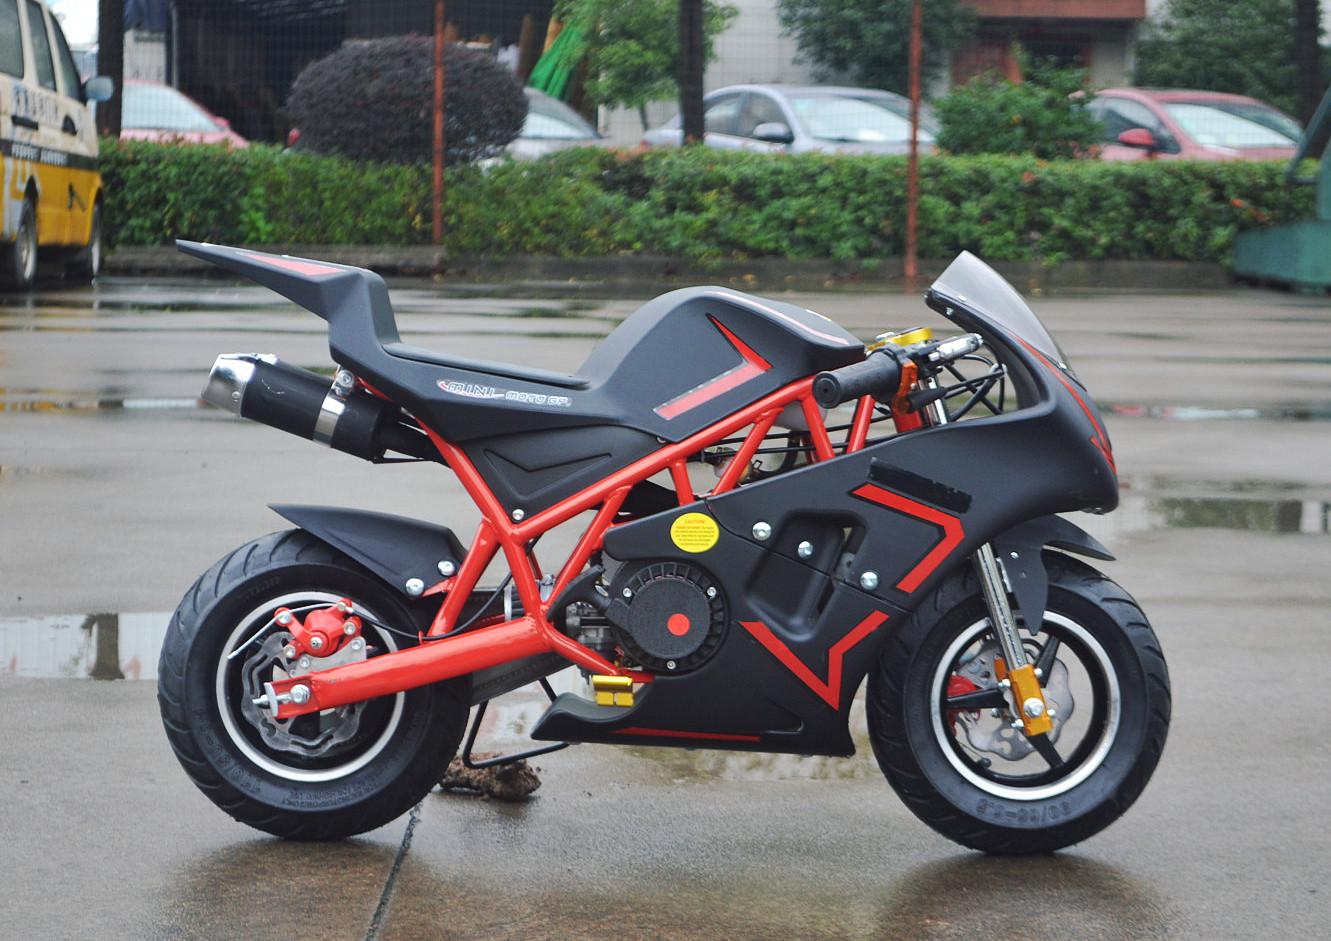 venom 49cc pocket bike mini moto gp m1 premium bike red ebay. Black Bedroom Furniture Sets. Home Design Ideas